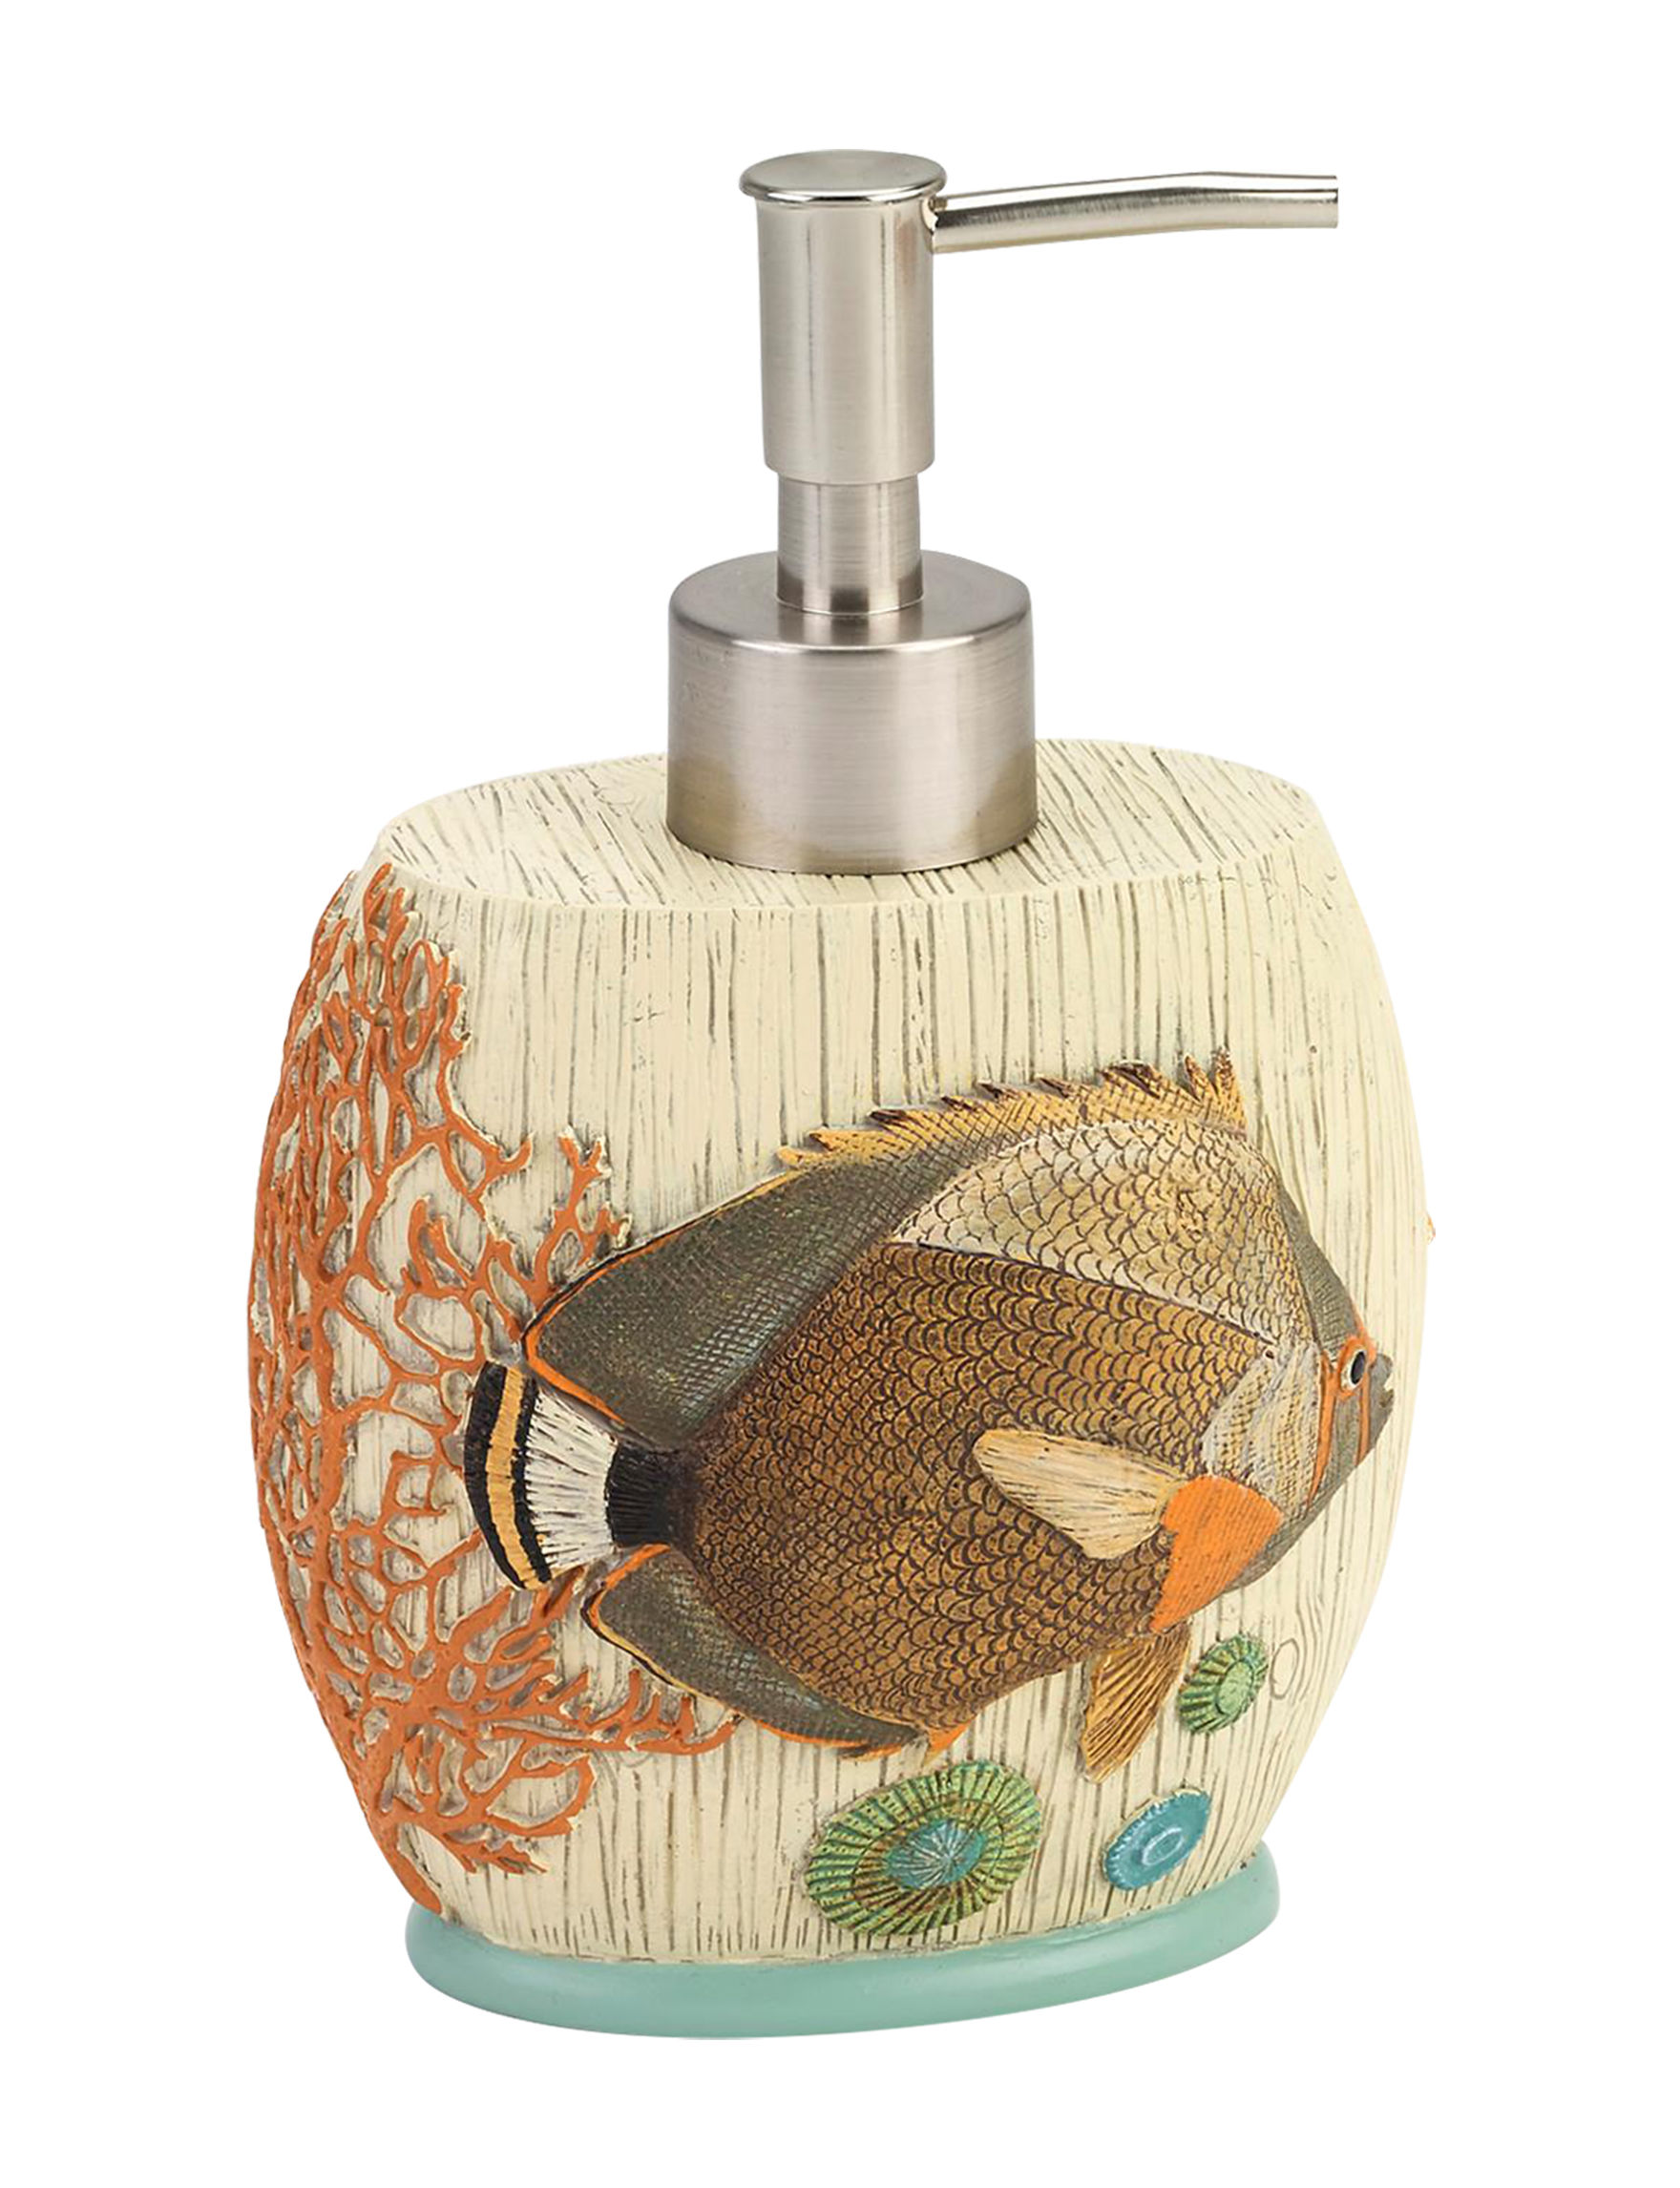 Avanti Beige / Multi Soap & Lotion Dispensers Bath Accessories